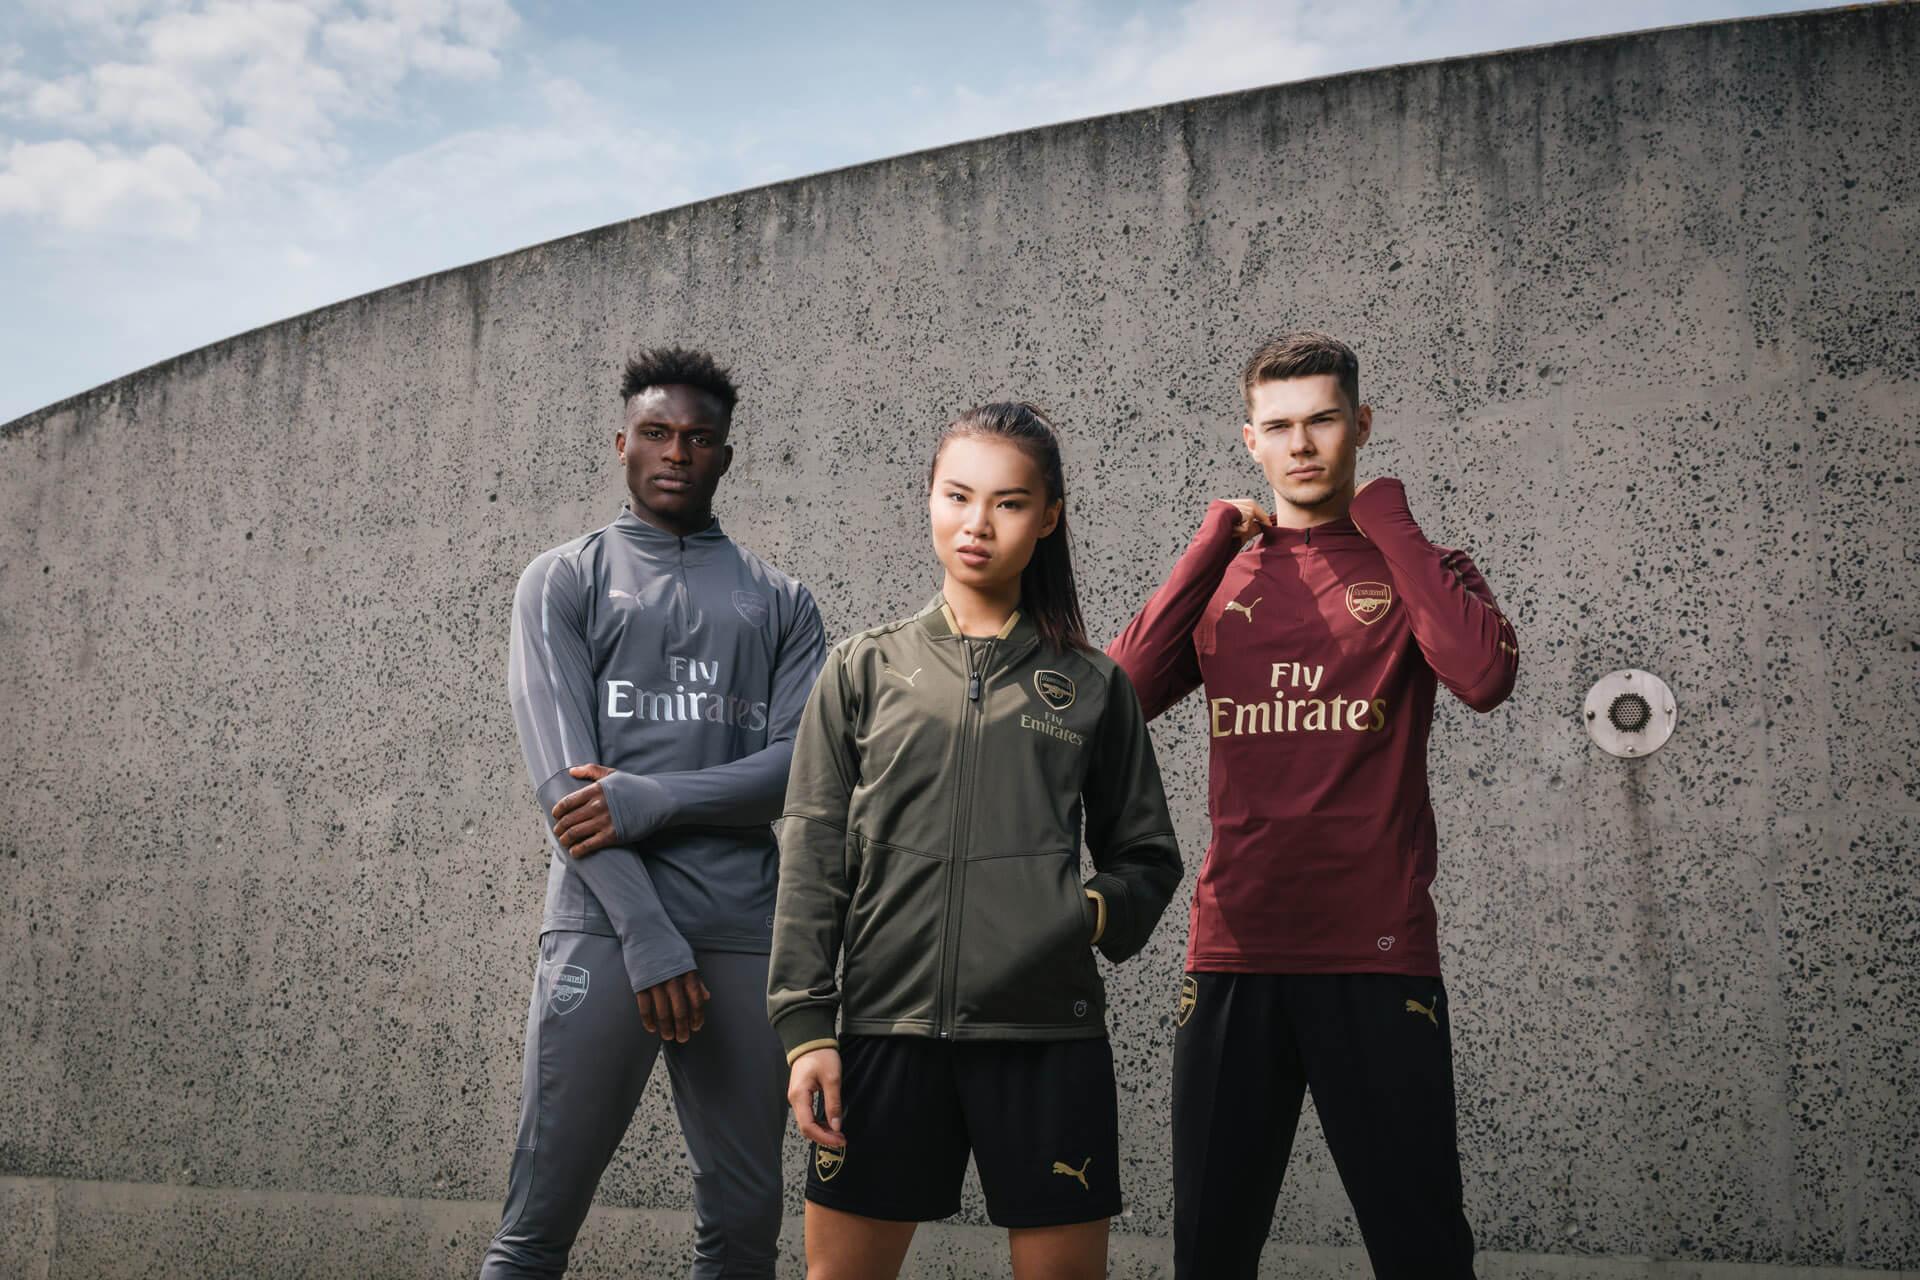 Arsenal Training Range 18/19 Video Production Birmingham